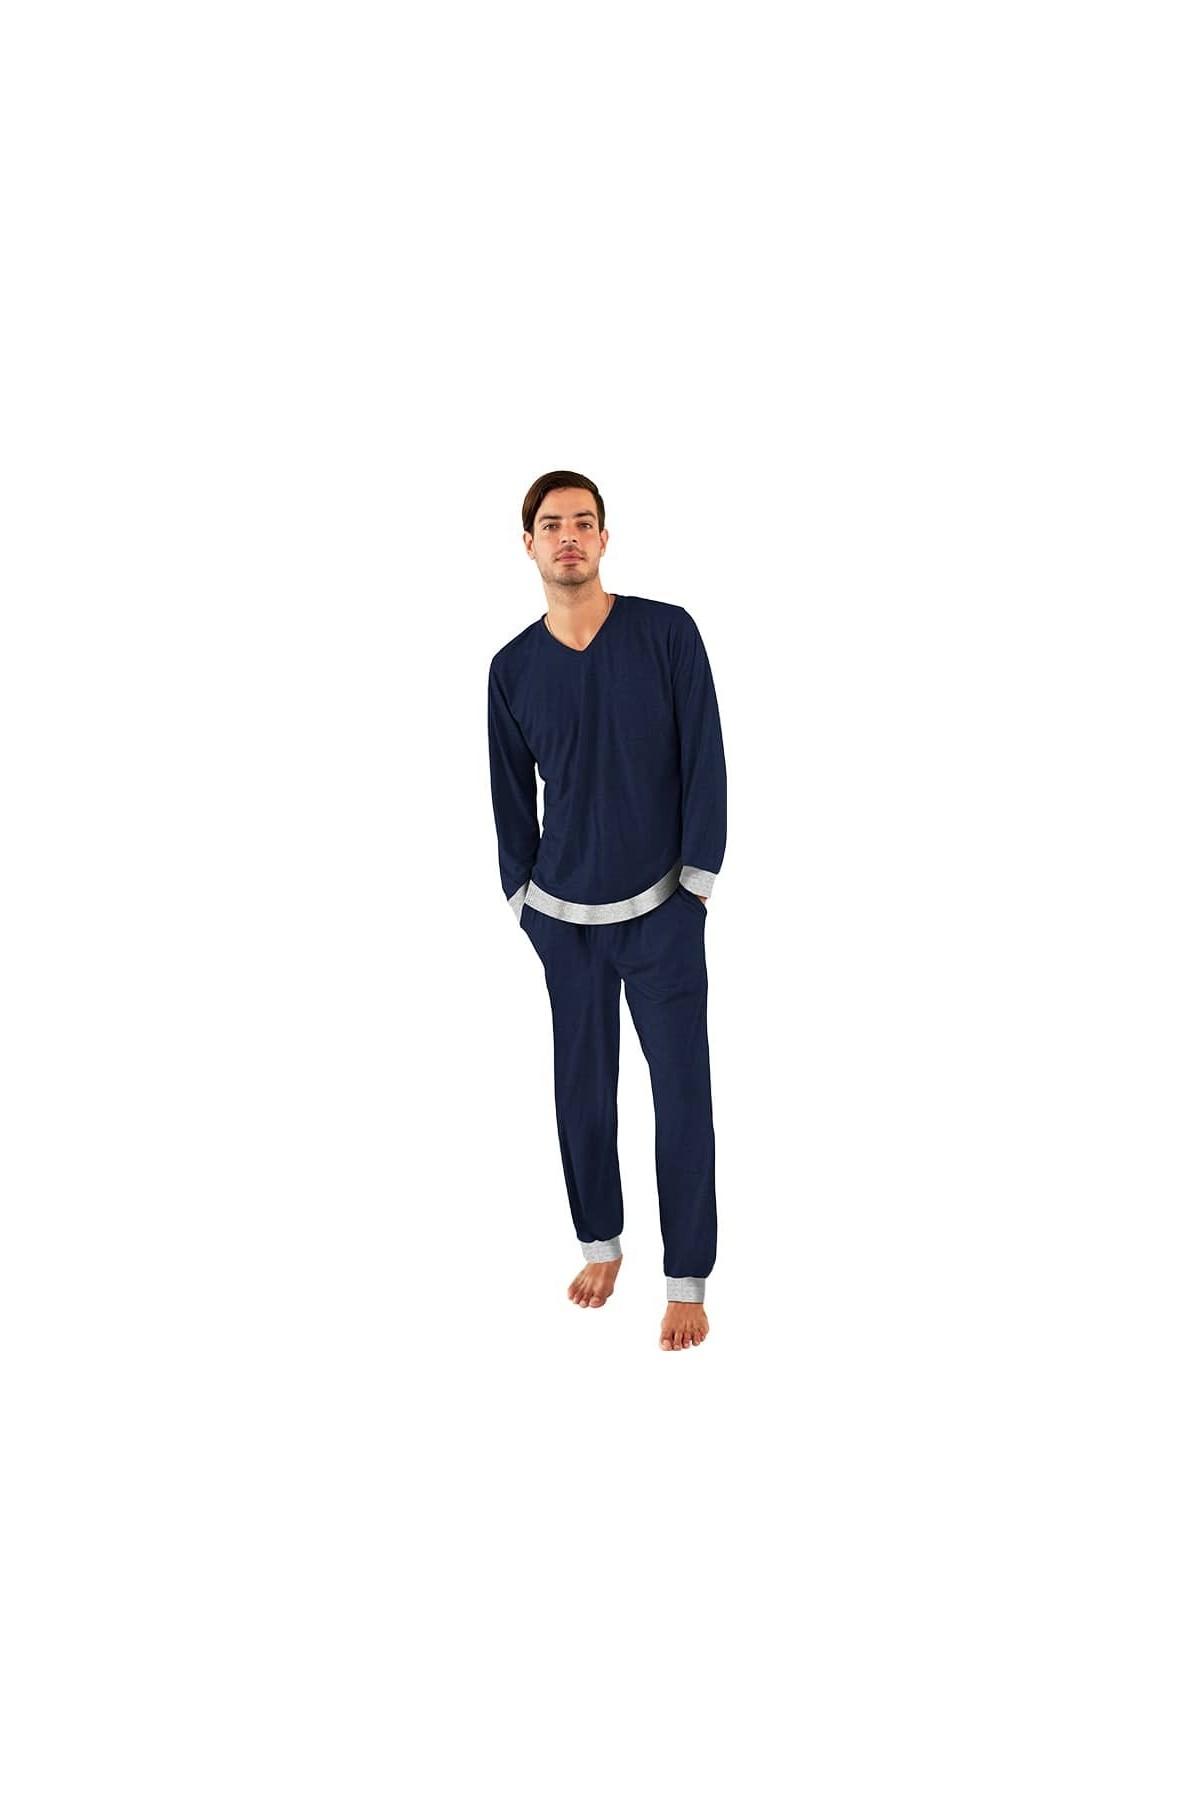 Pijama Para Hombre Manga Larga Con Pantalon Navy Gris Tallas L Large Colores Azul Marino